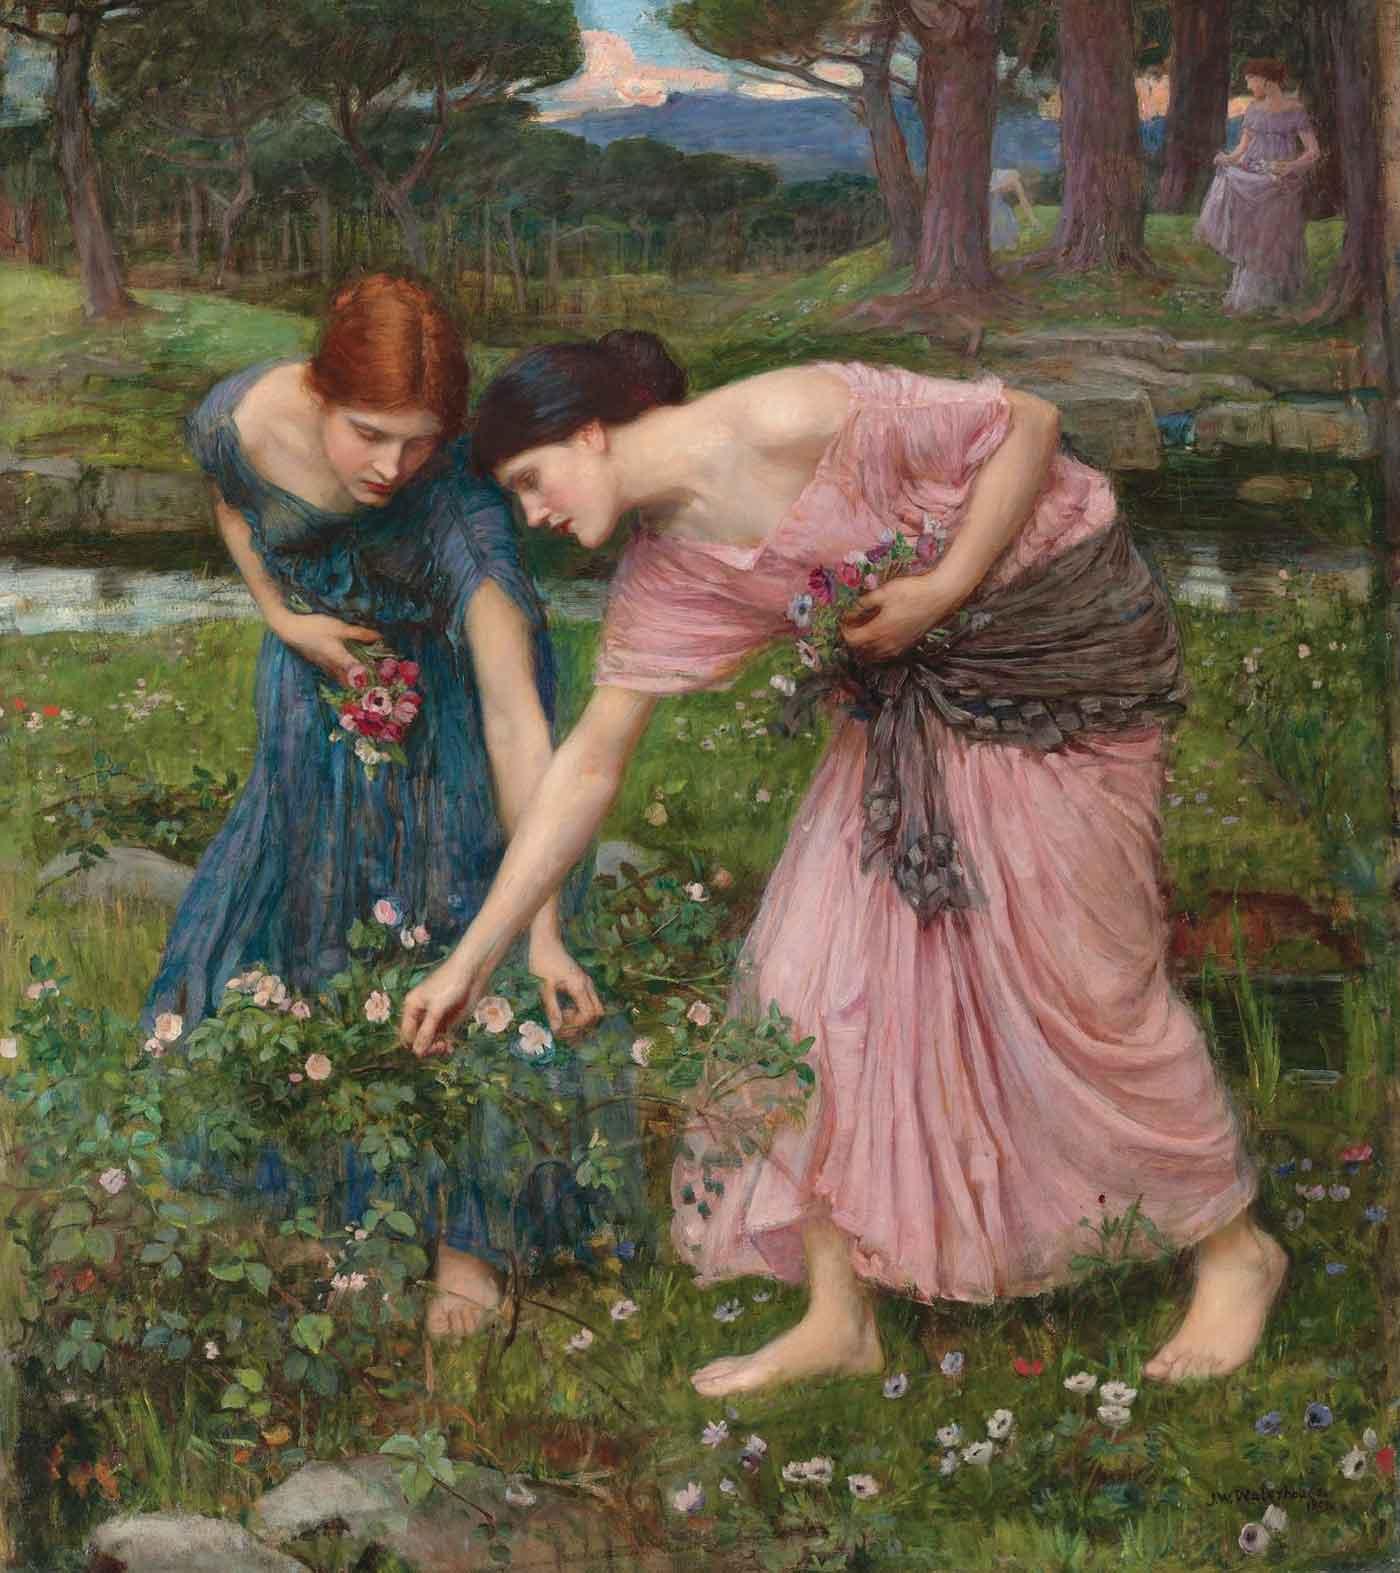 Gather Ye Rosebuds While Ye May, by J.W. Waterhouse